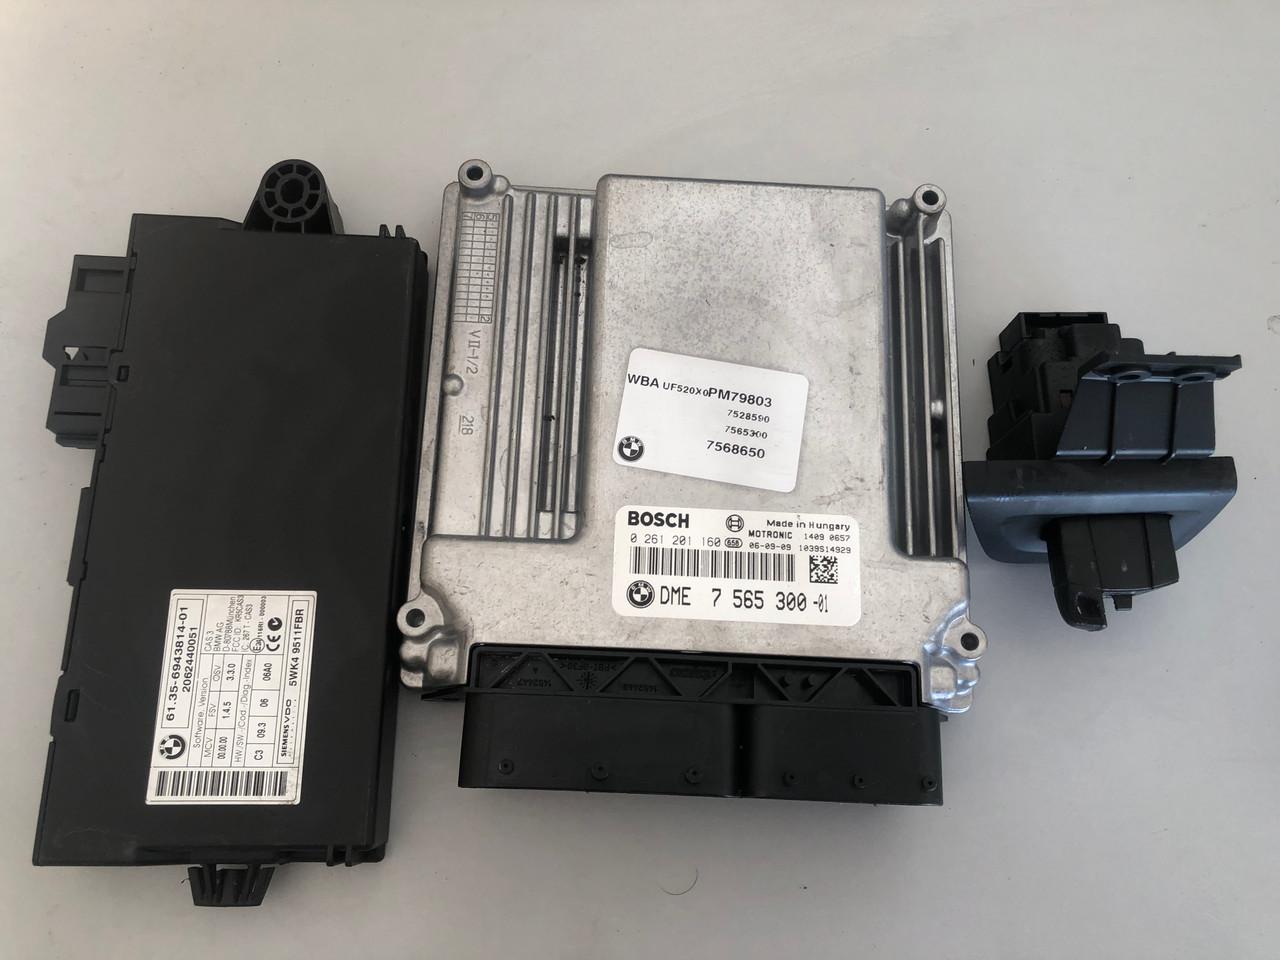 BMW E87 120I USED ENGINE IMOBILIZER EWS KIT DME 7 565 300 - 01